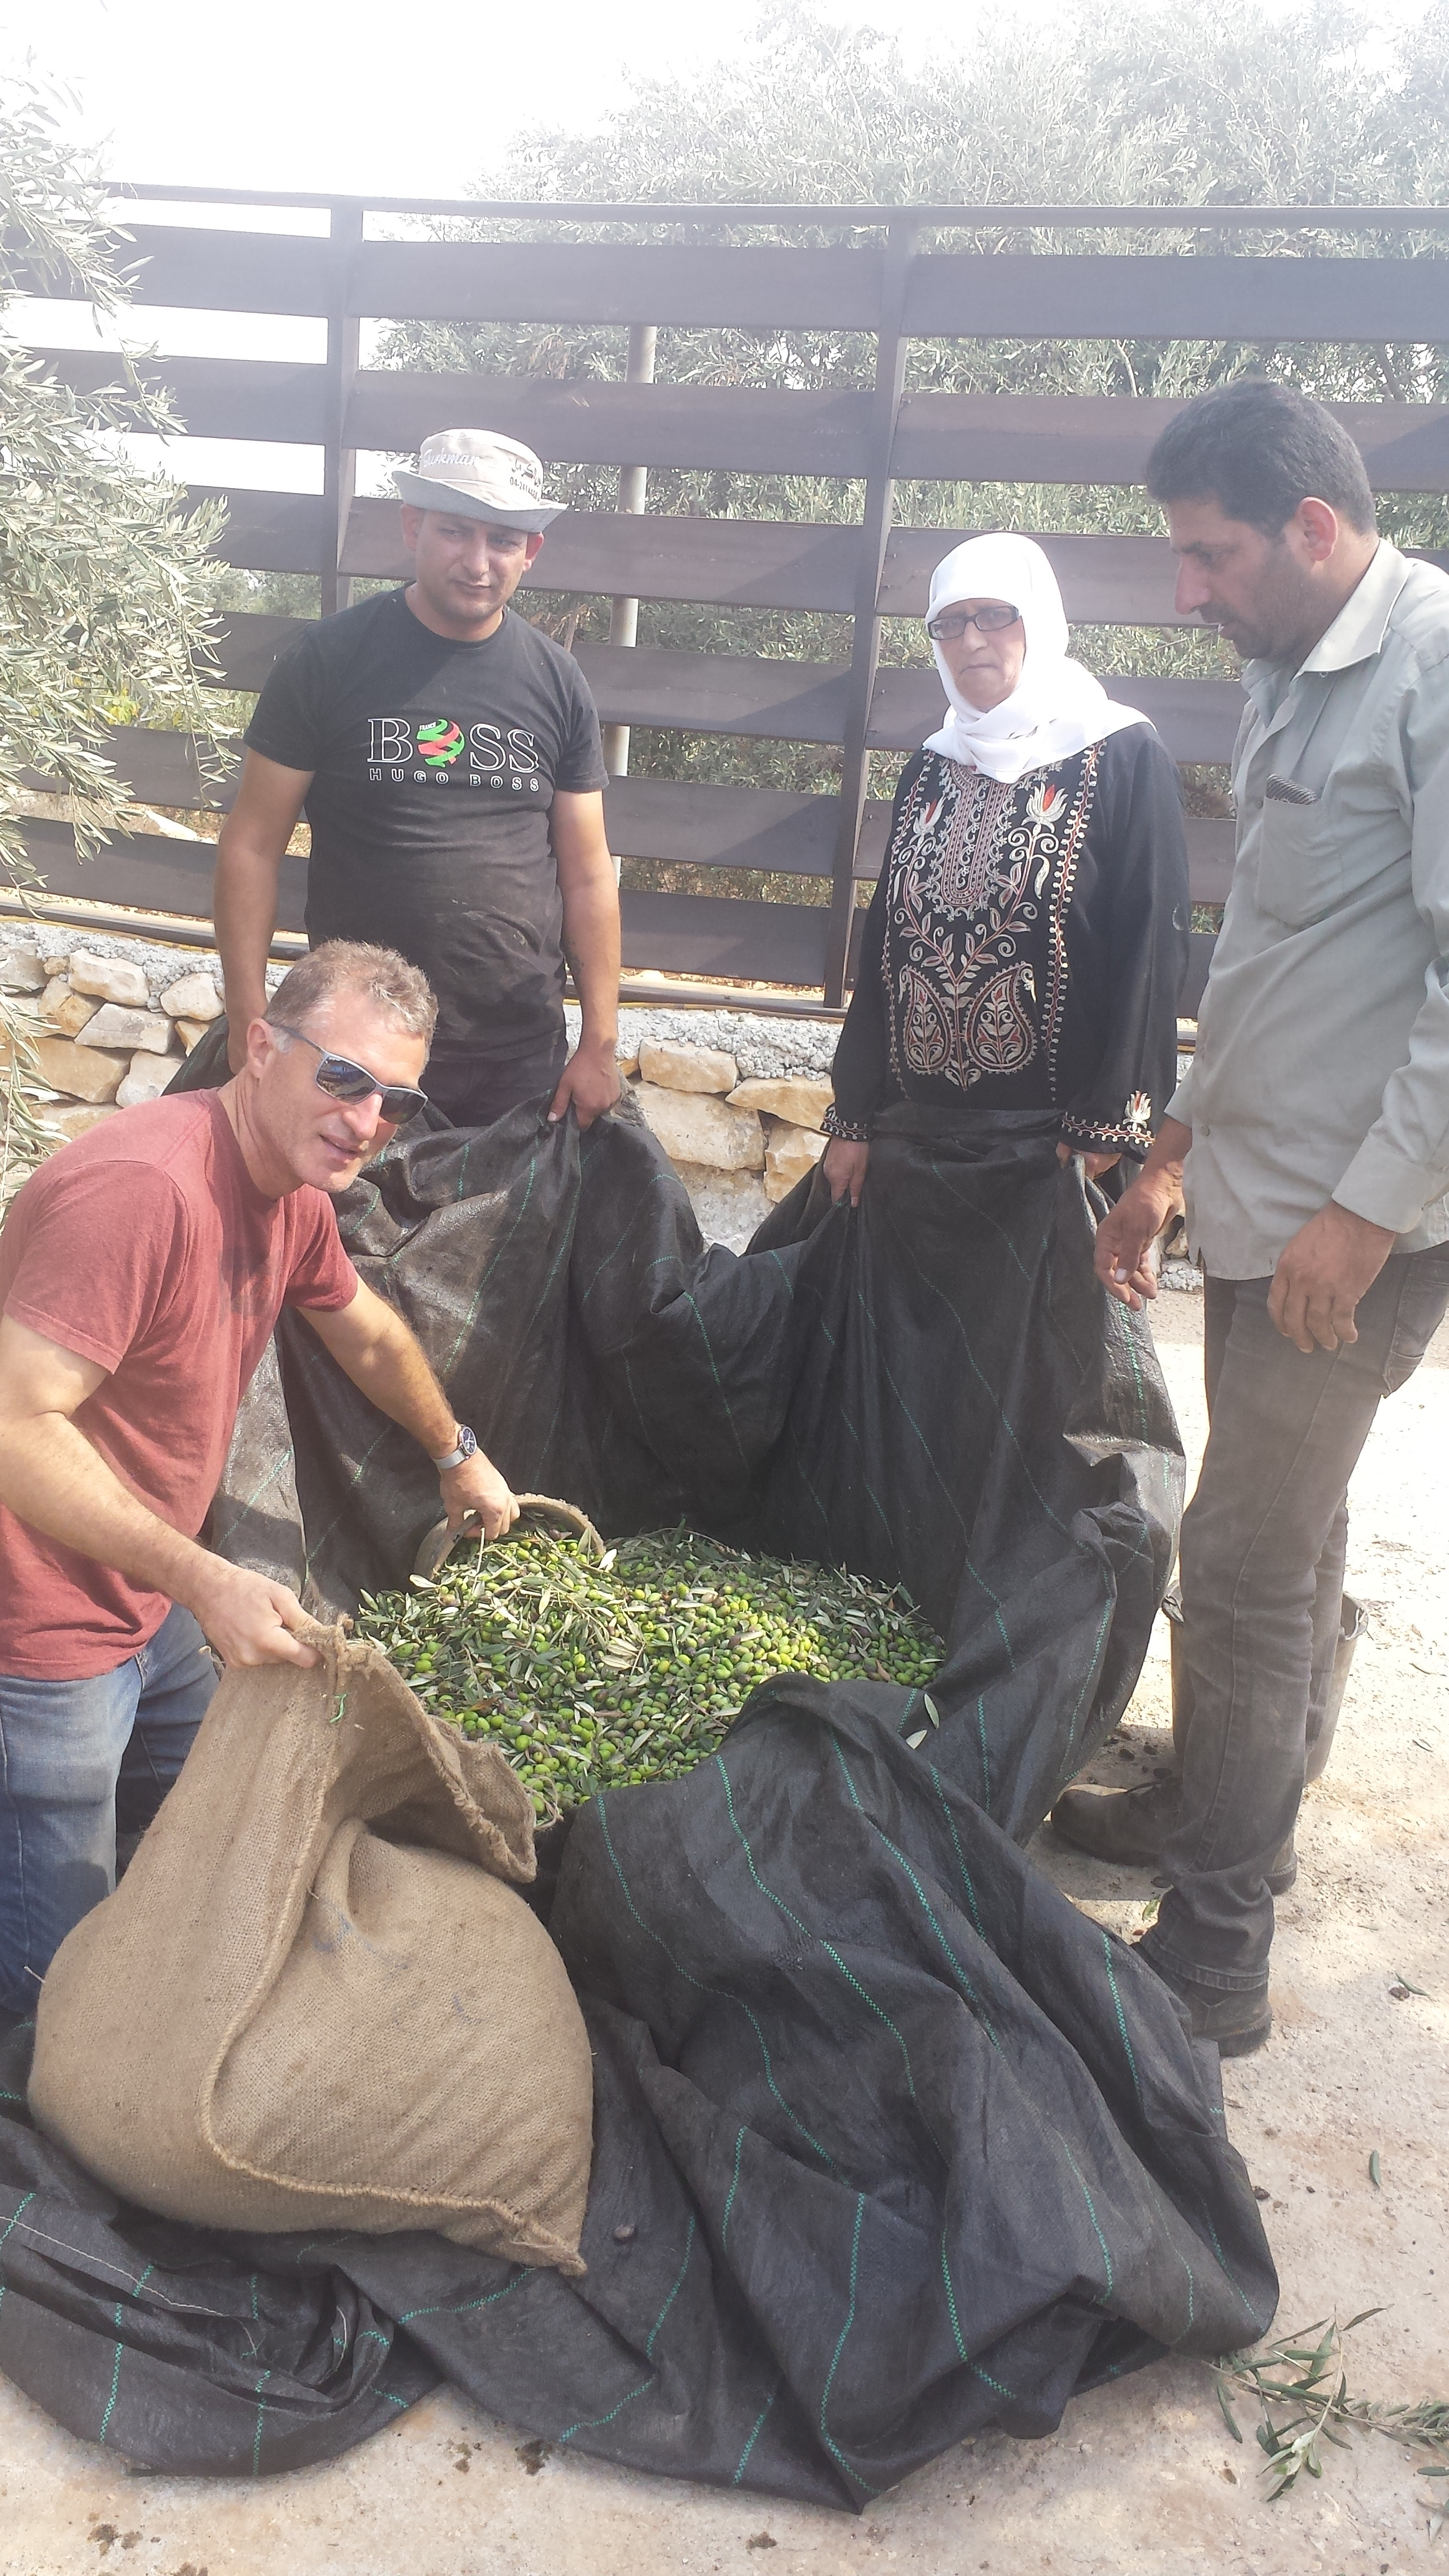 Olive sacks - Maad - Hamadnehs - Megan.jpg